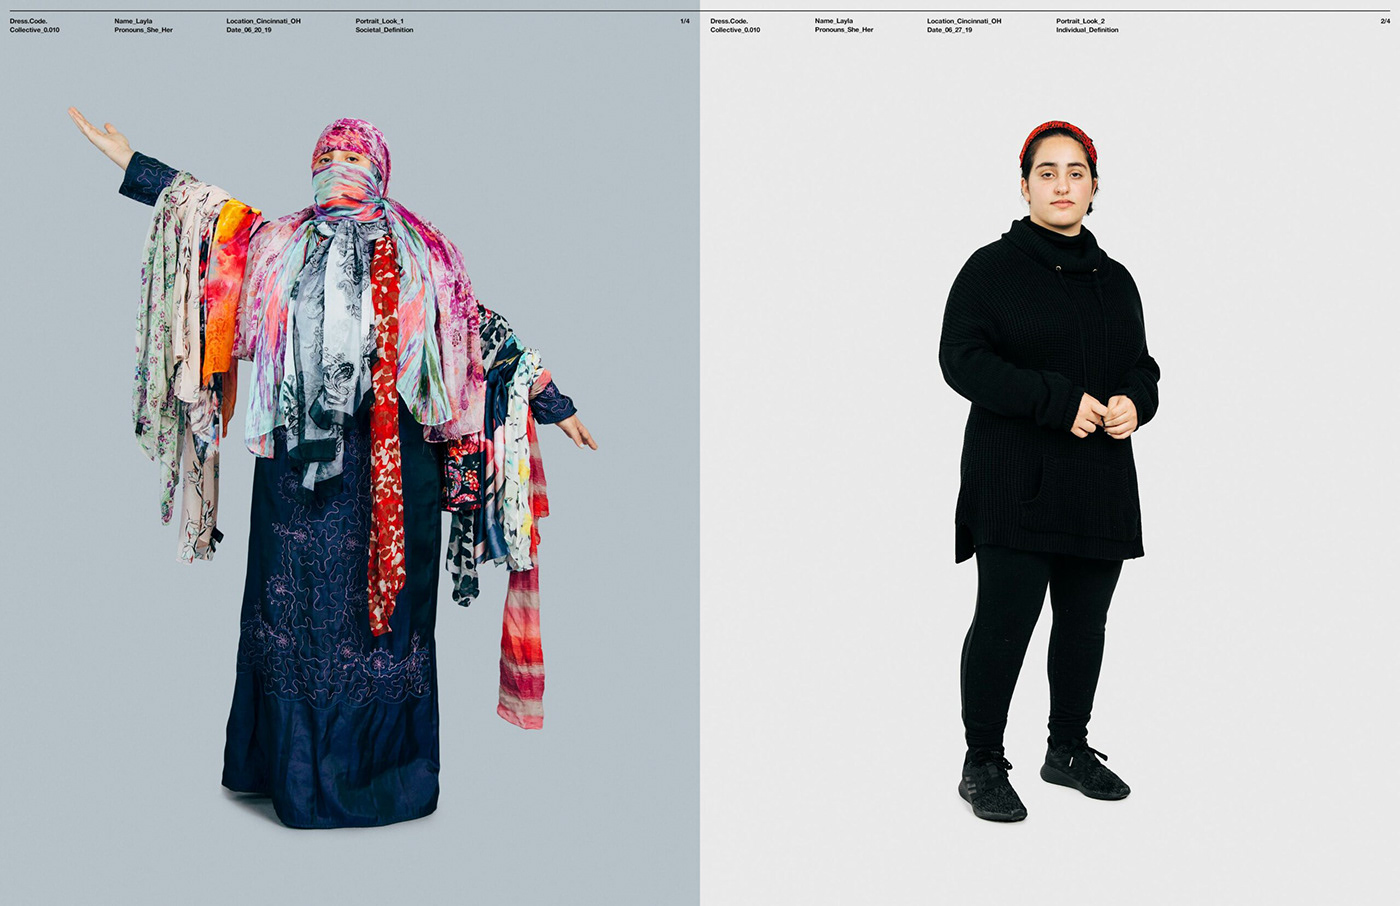 Fashion  feminism Gender helvetica online gallery photography series portraits social art Studio Photography Website